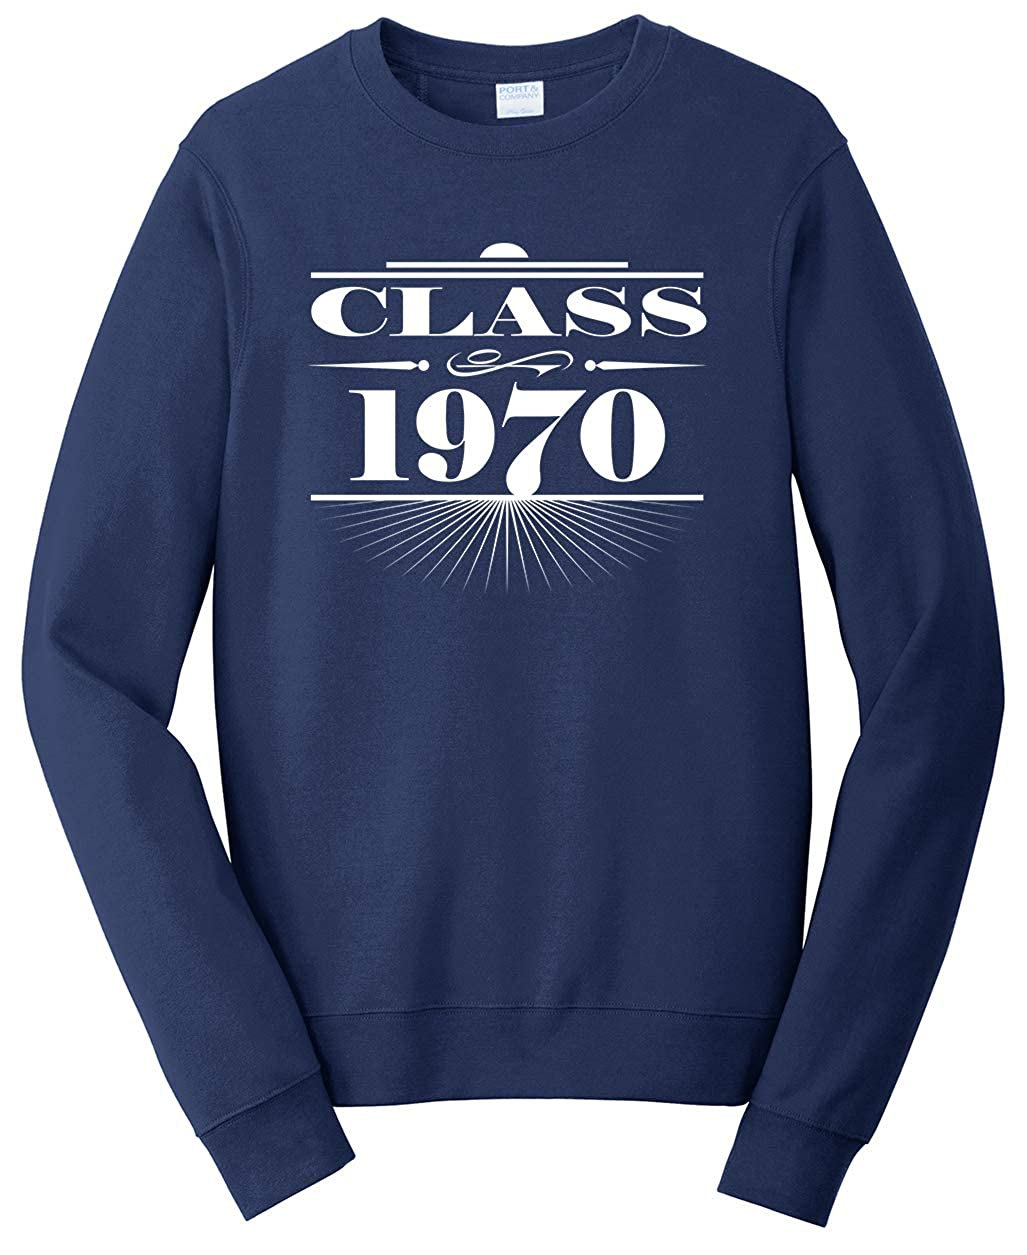 Small Tenacitee Unisex Art Deco Class of 1970 Sweatshirt Navy